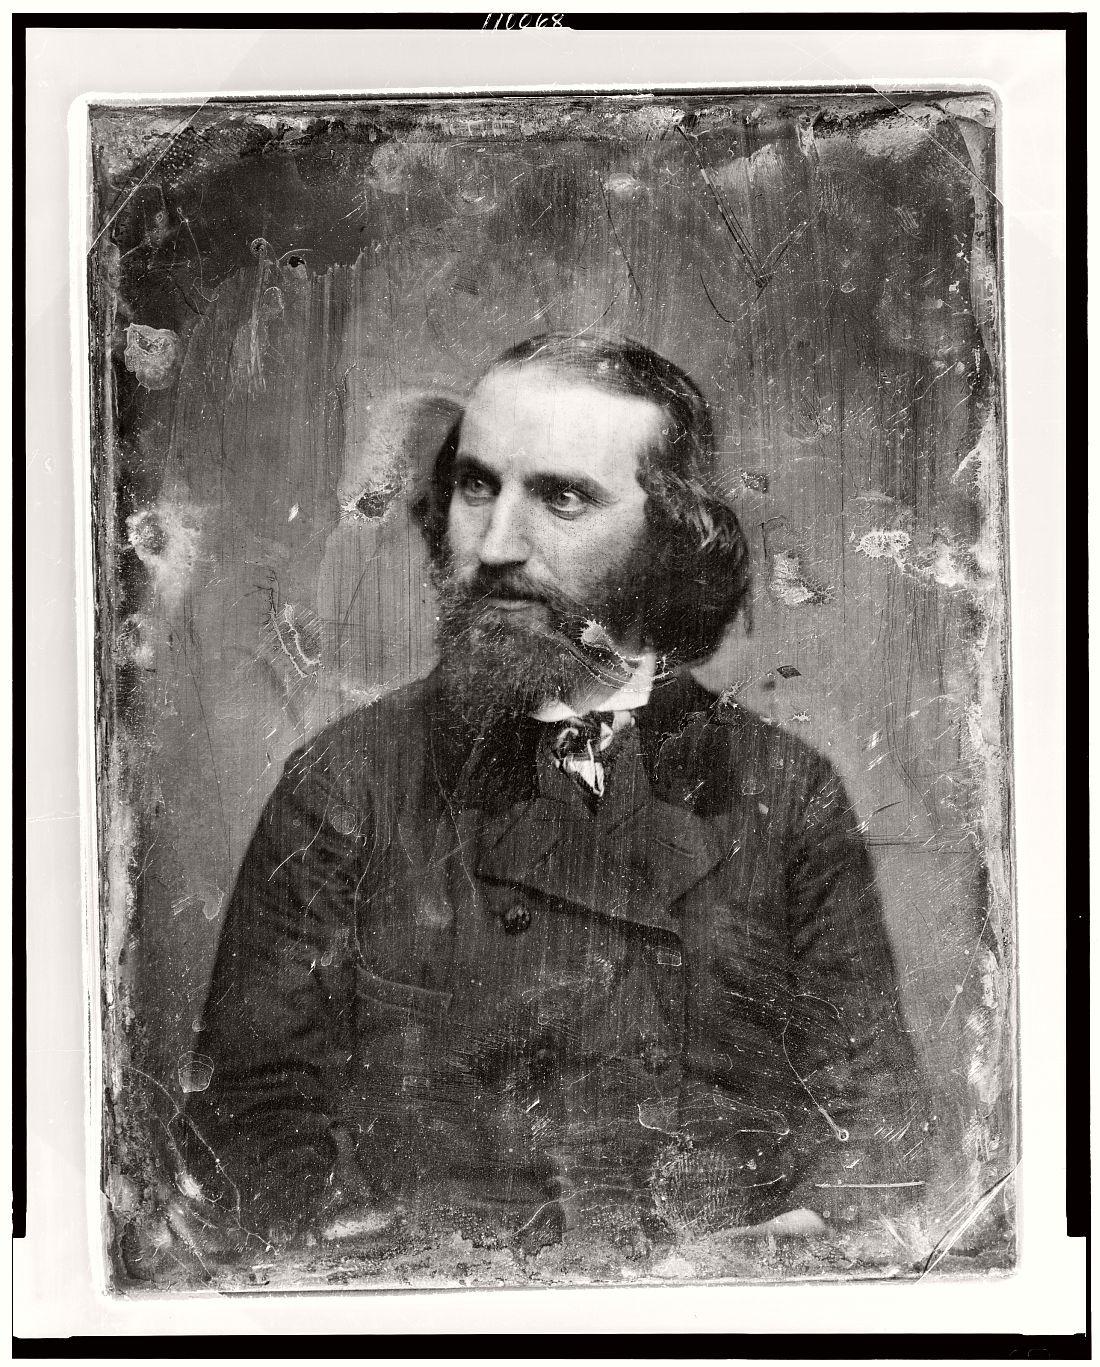 vintage-daguerreotype-portraits-from-xix-century-1844-1860-54